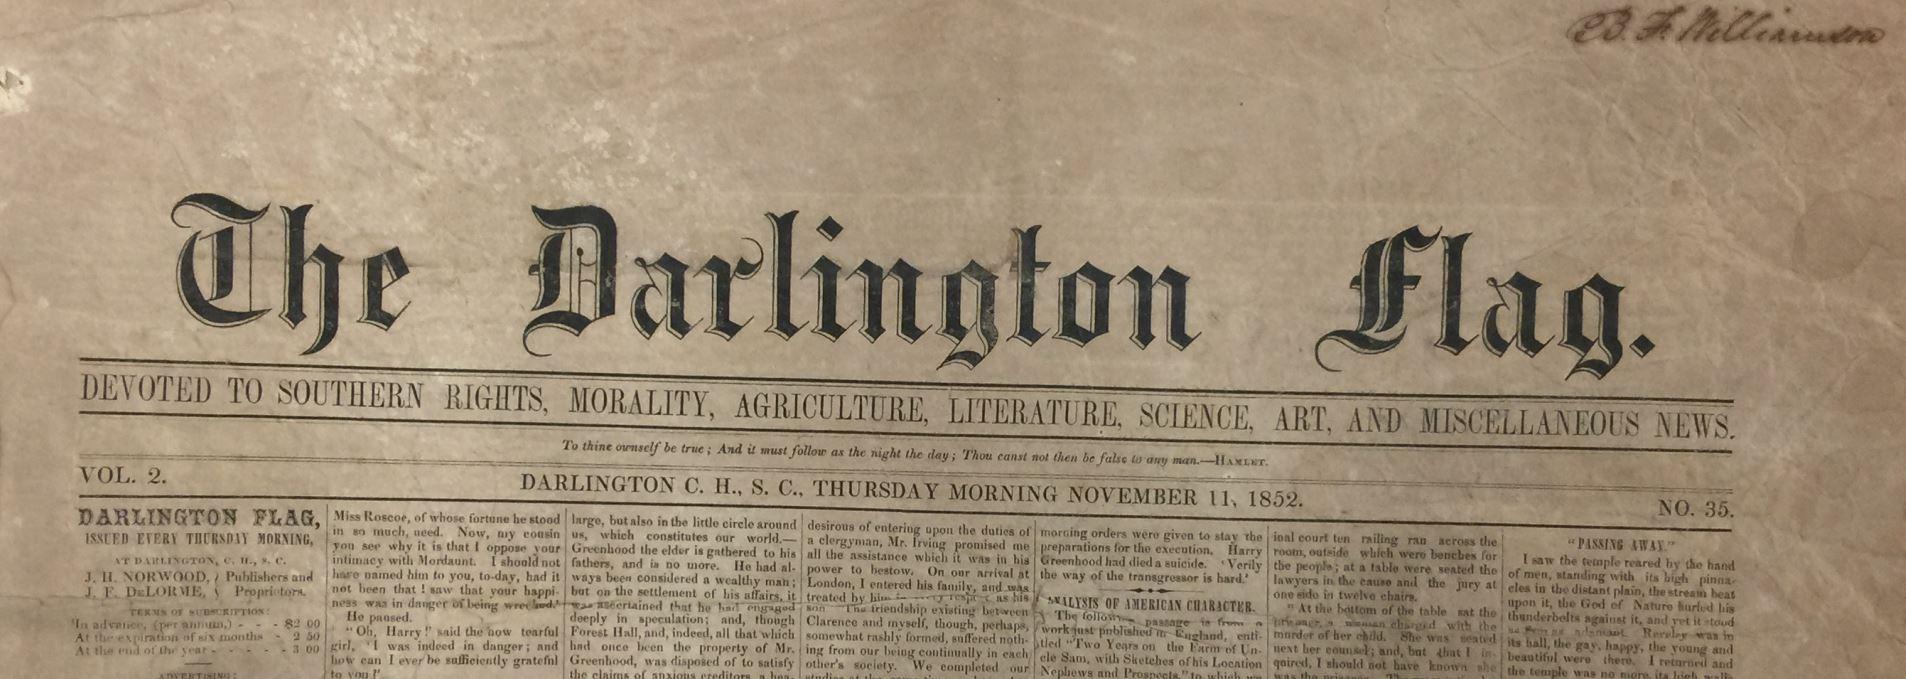 darlington flag.JPG